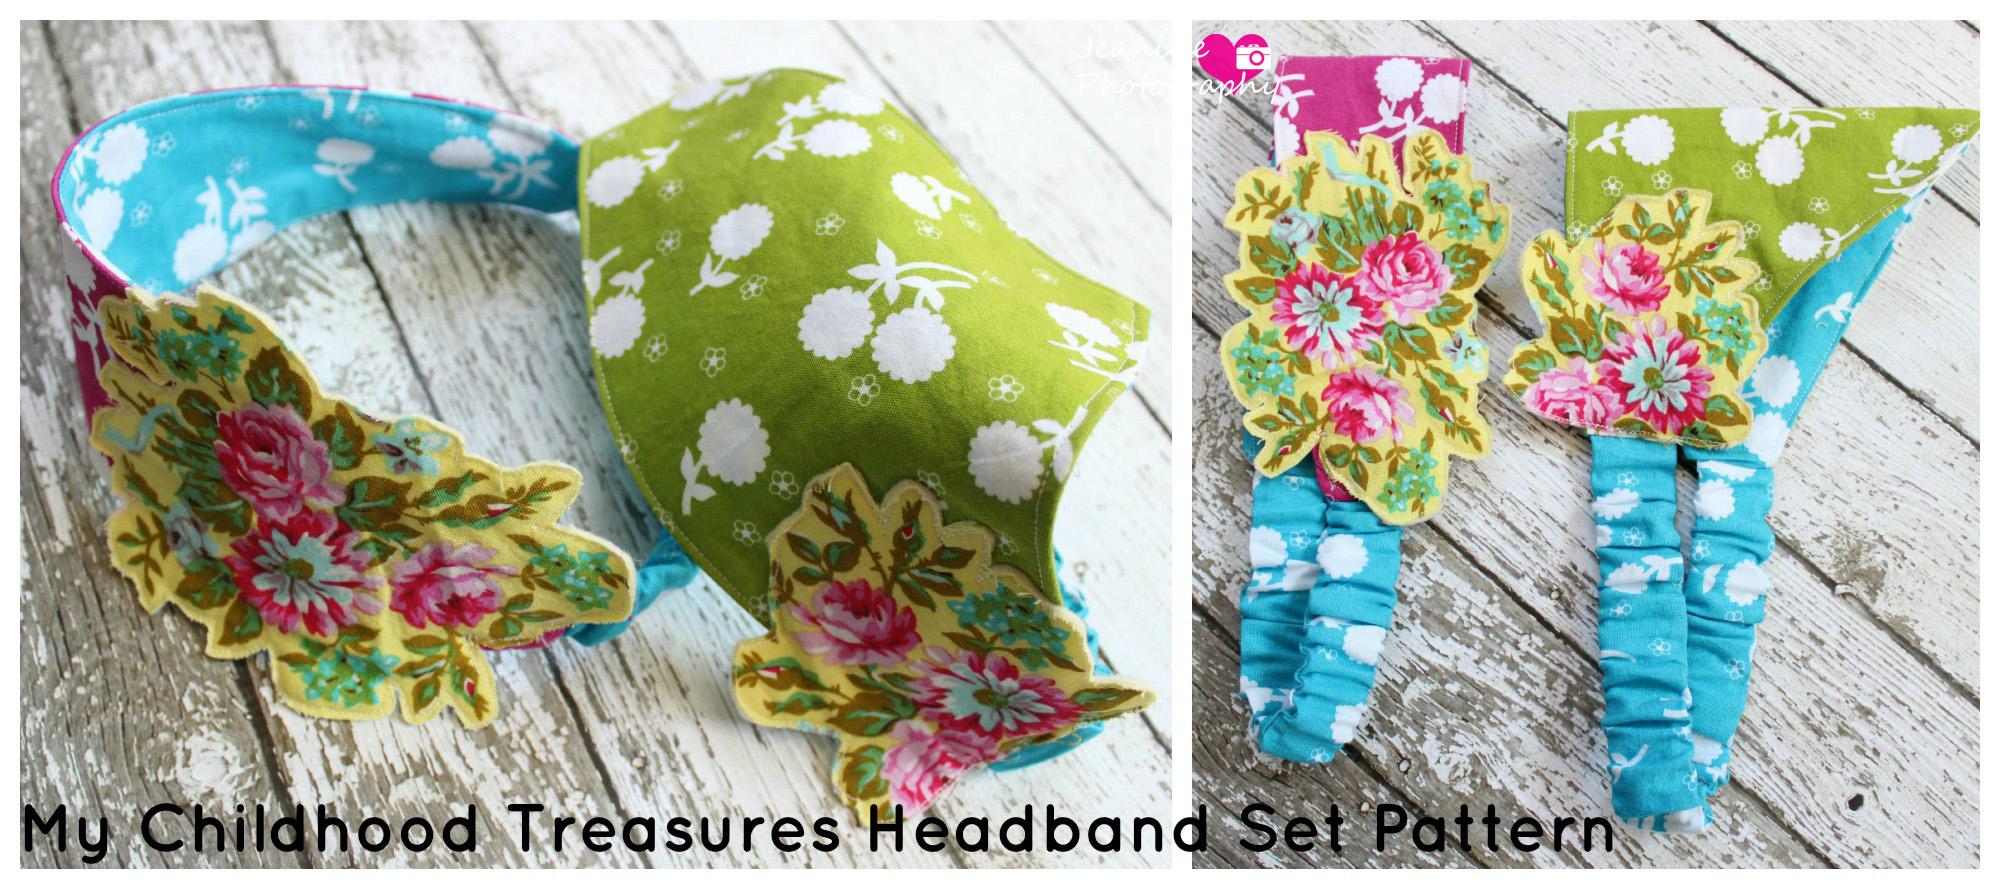 Retro Headbands Pattern from My Childhood Treasures- Pattern Revolution